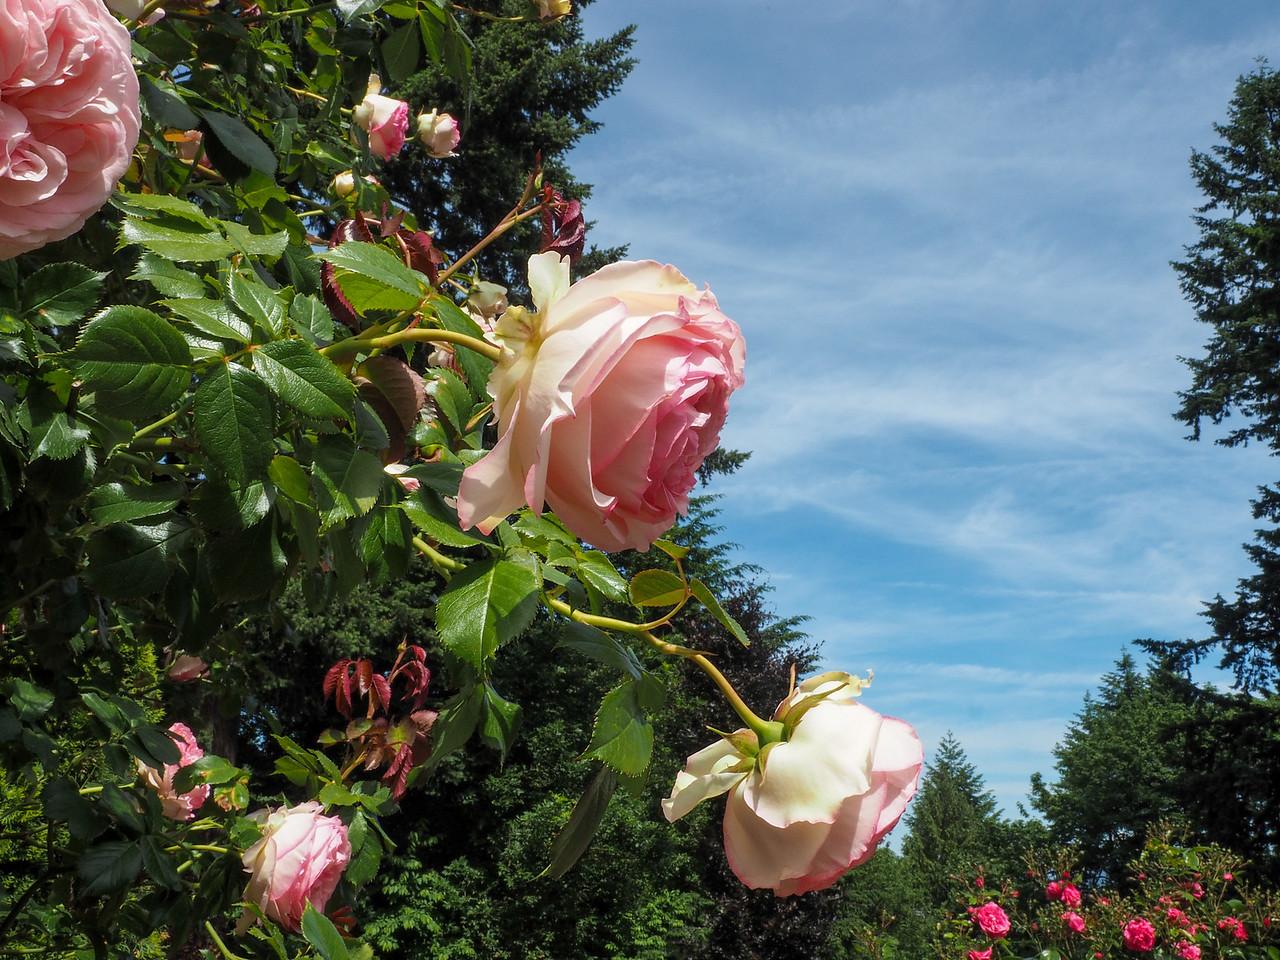 International Rose Test Garden in Portland